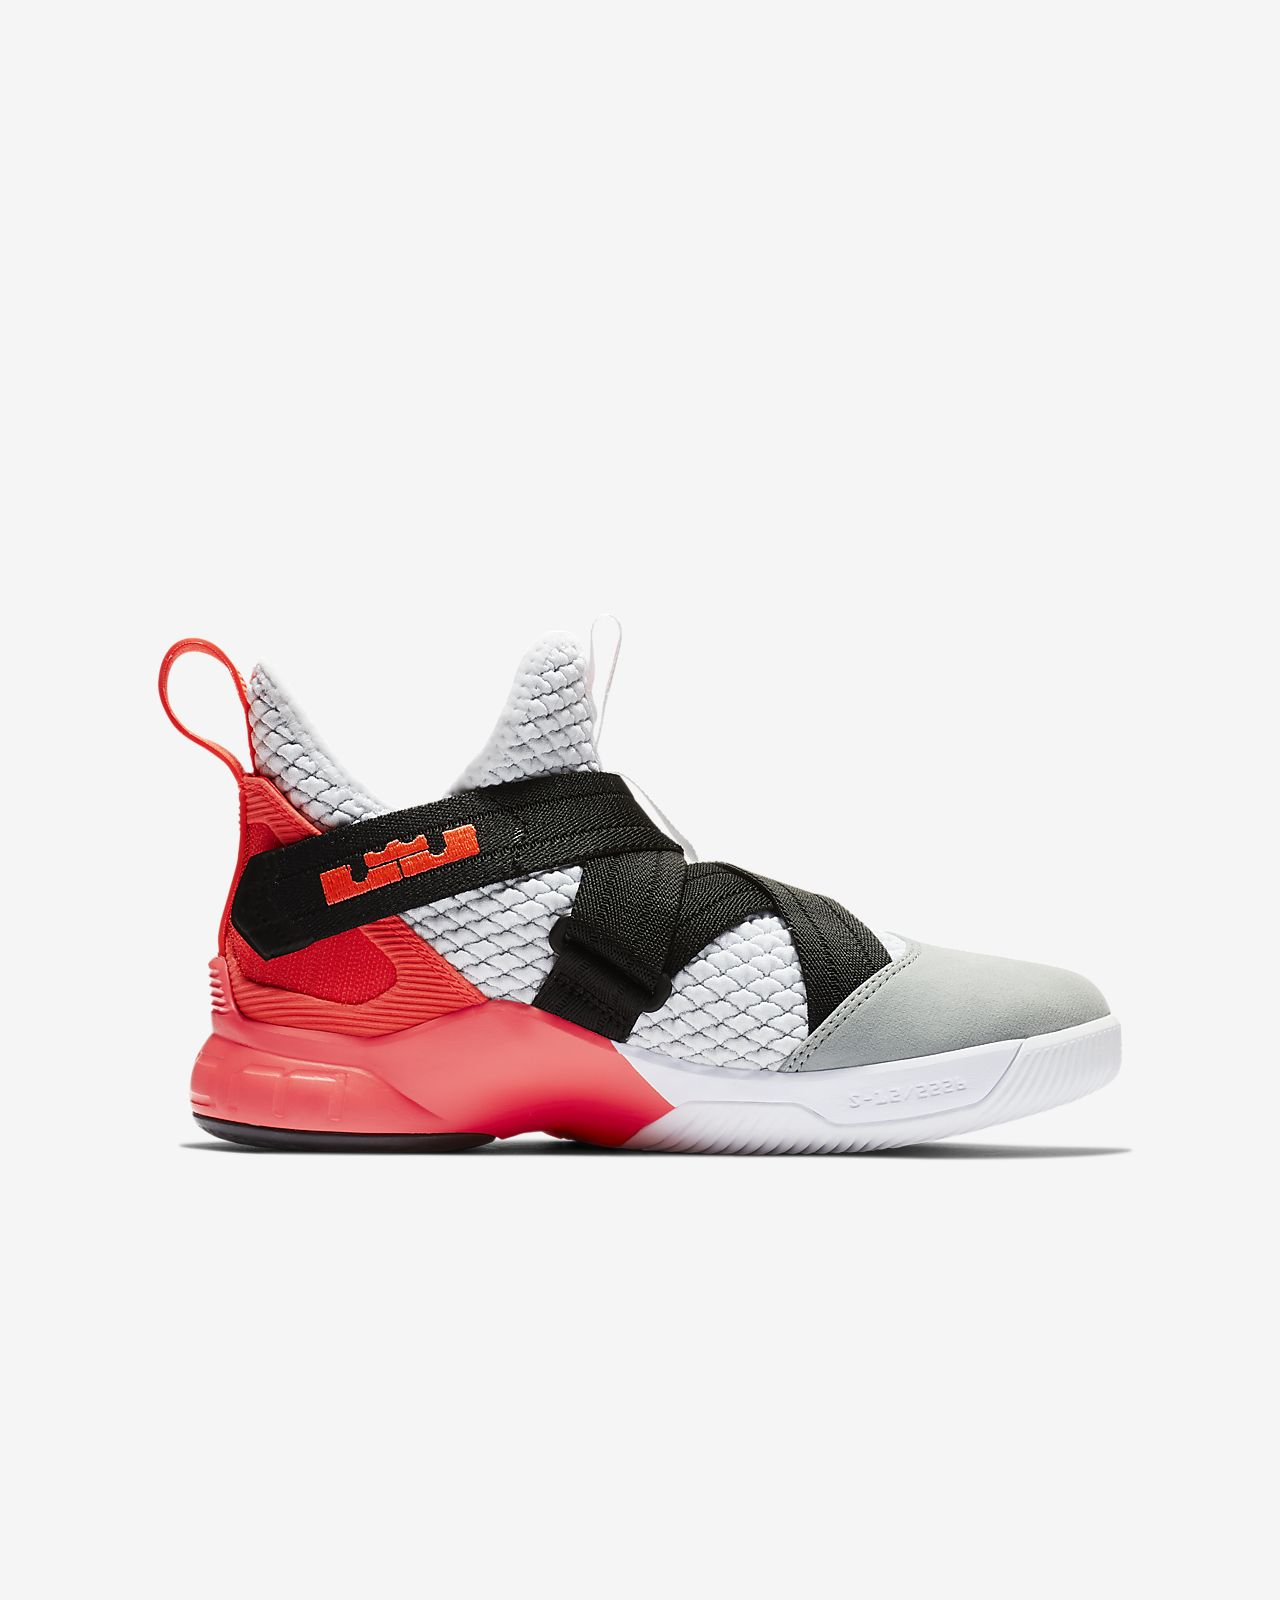 super popular 02e6f 211a9 LeBron Soldier 12 SFG Big Kids' Basketball Shoe